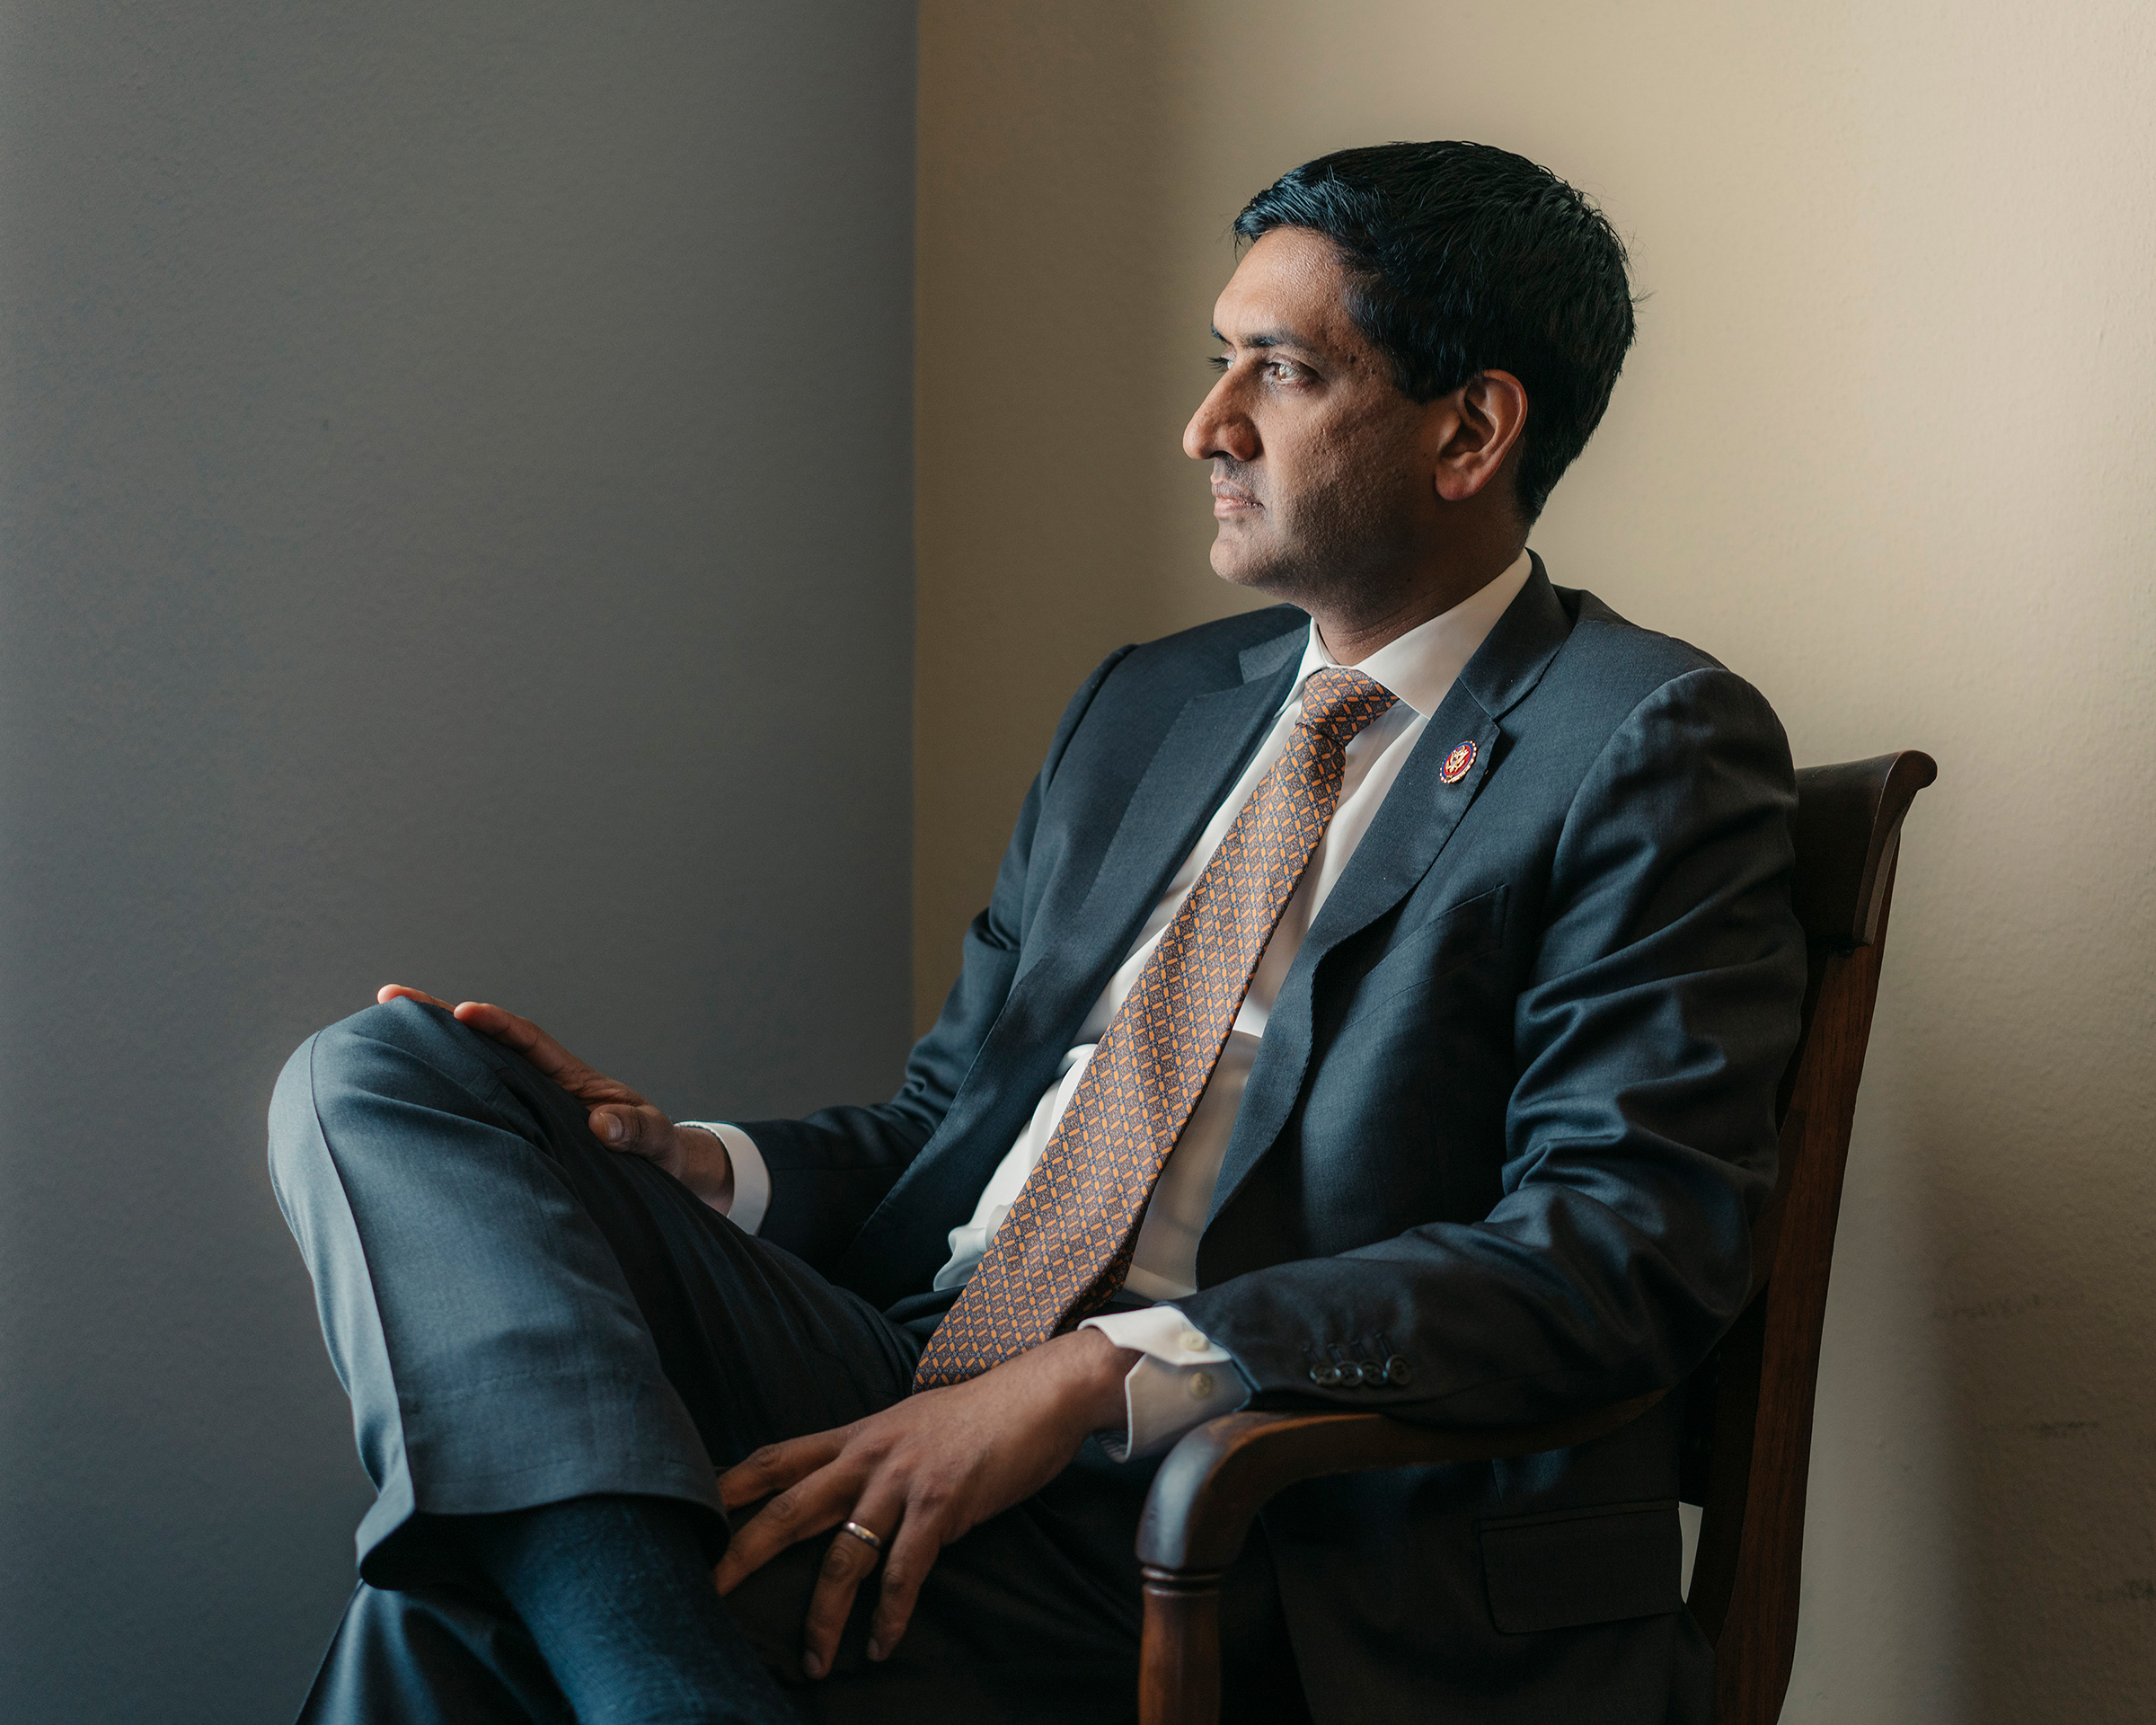 Rep. Ro Khanna (D-Calif.) in Washington, D.C., in December 2019.